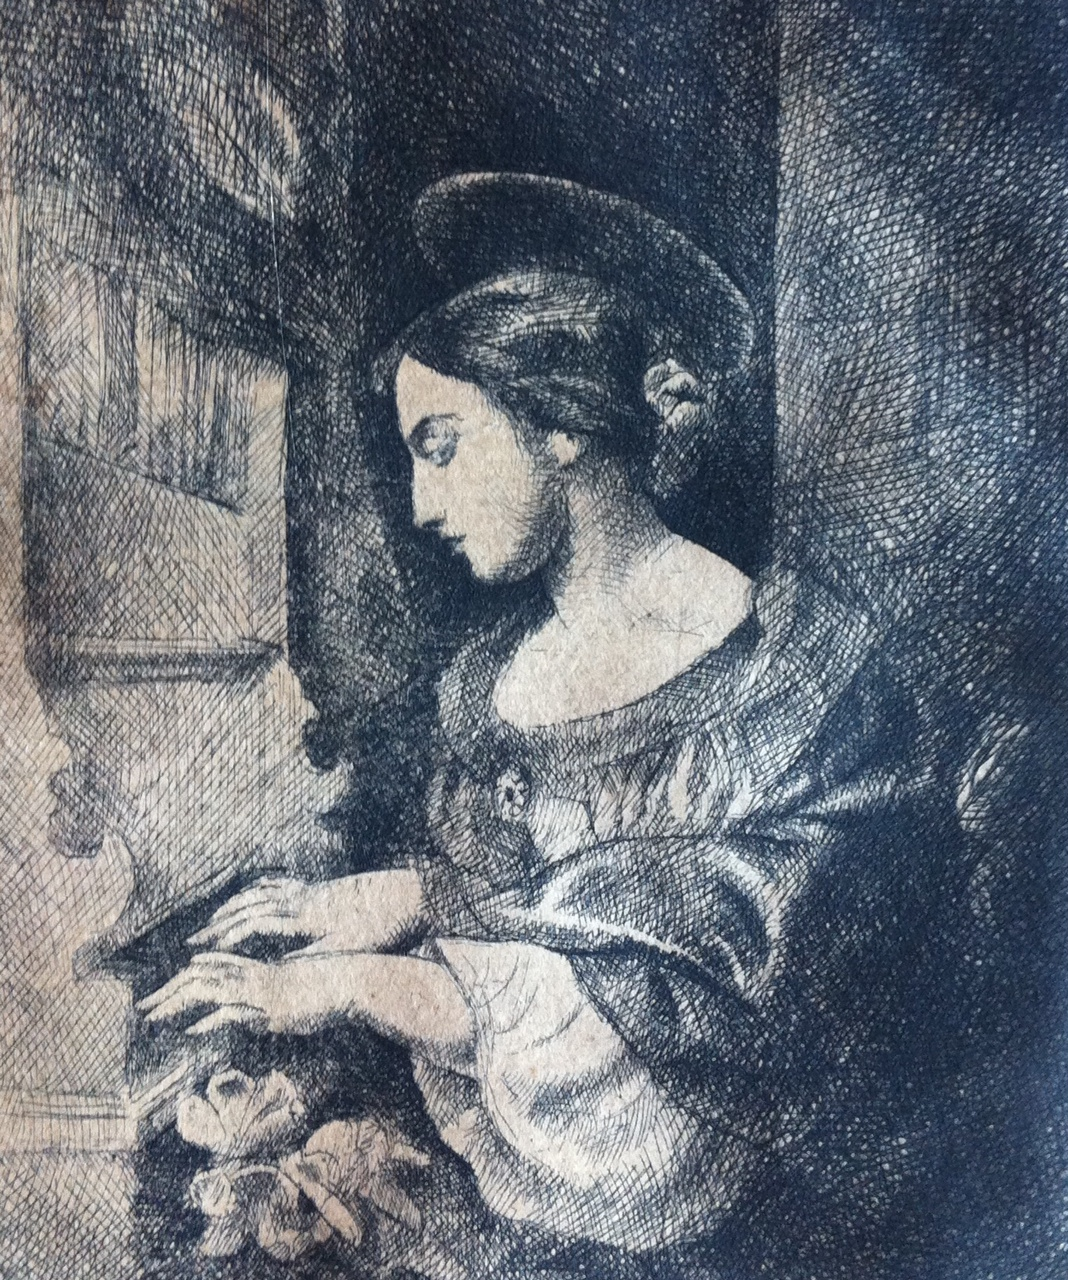 Patkó, Károly: Carlo Dolci: Saint Cecilia